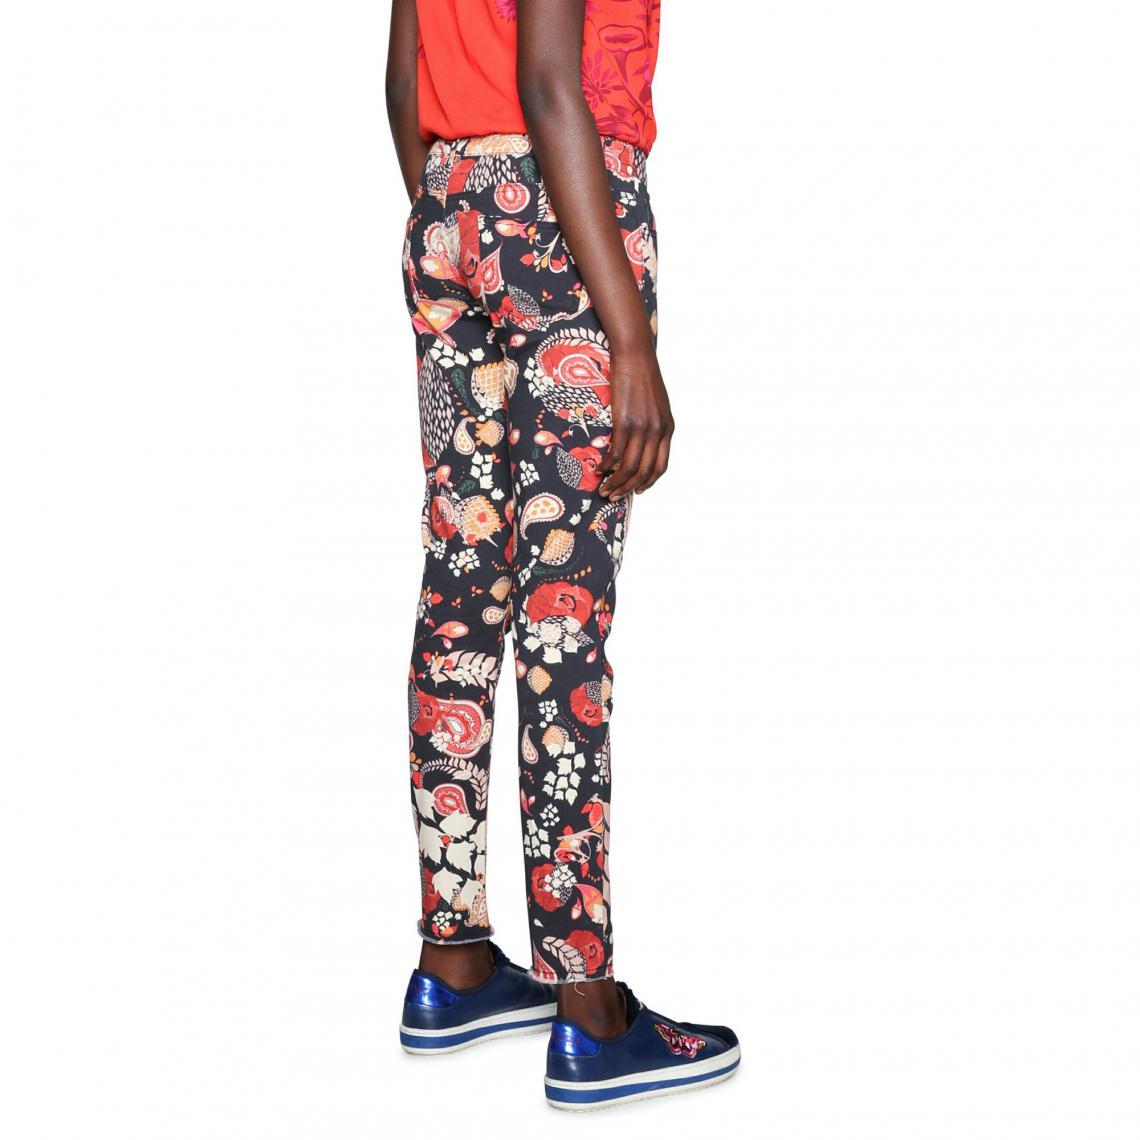 0308527b15a Pantalon slim femme Desigual - Noir